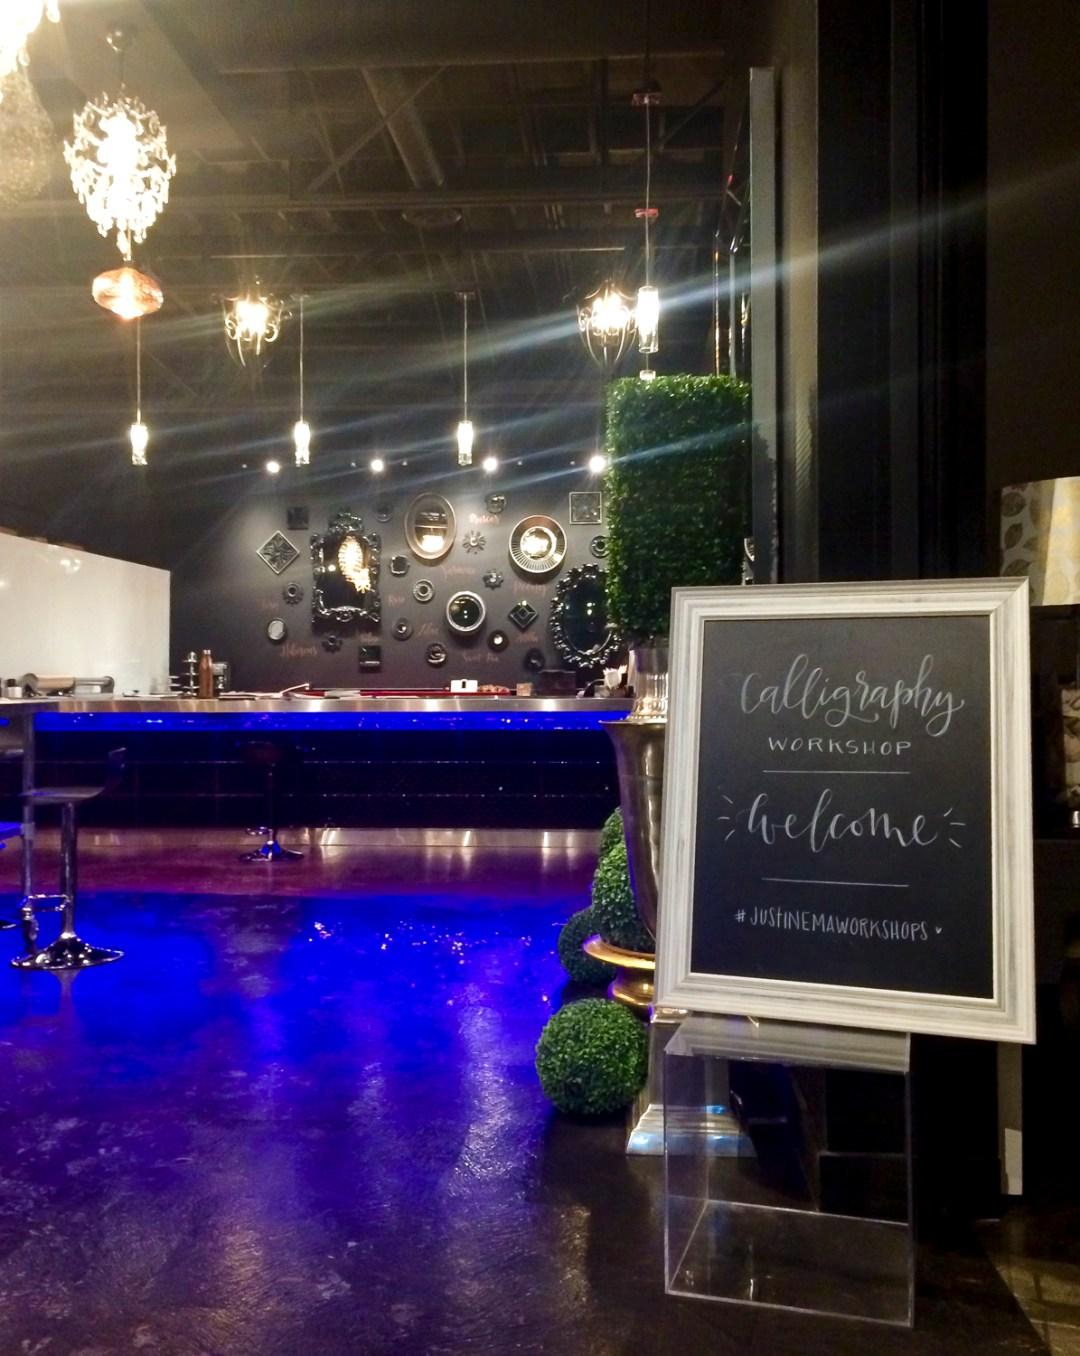 Edmonton Calligraphy Workshop with Justine Ma   Dutchie Love